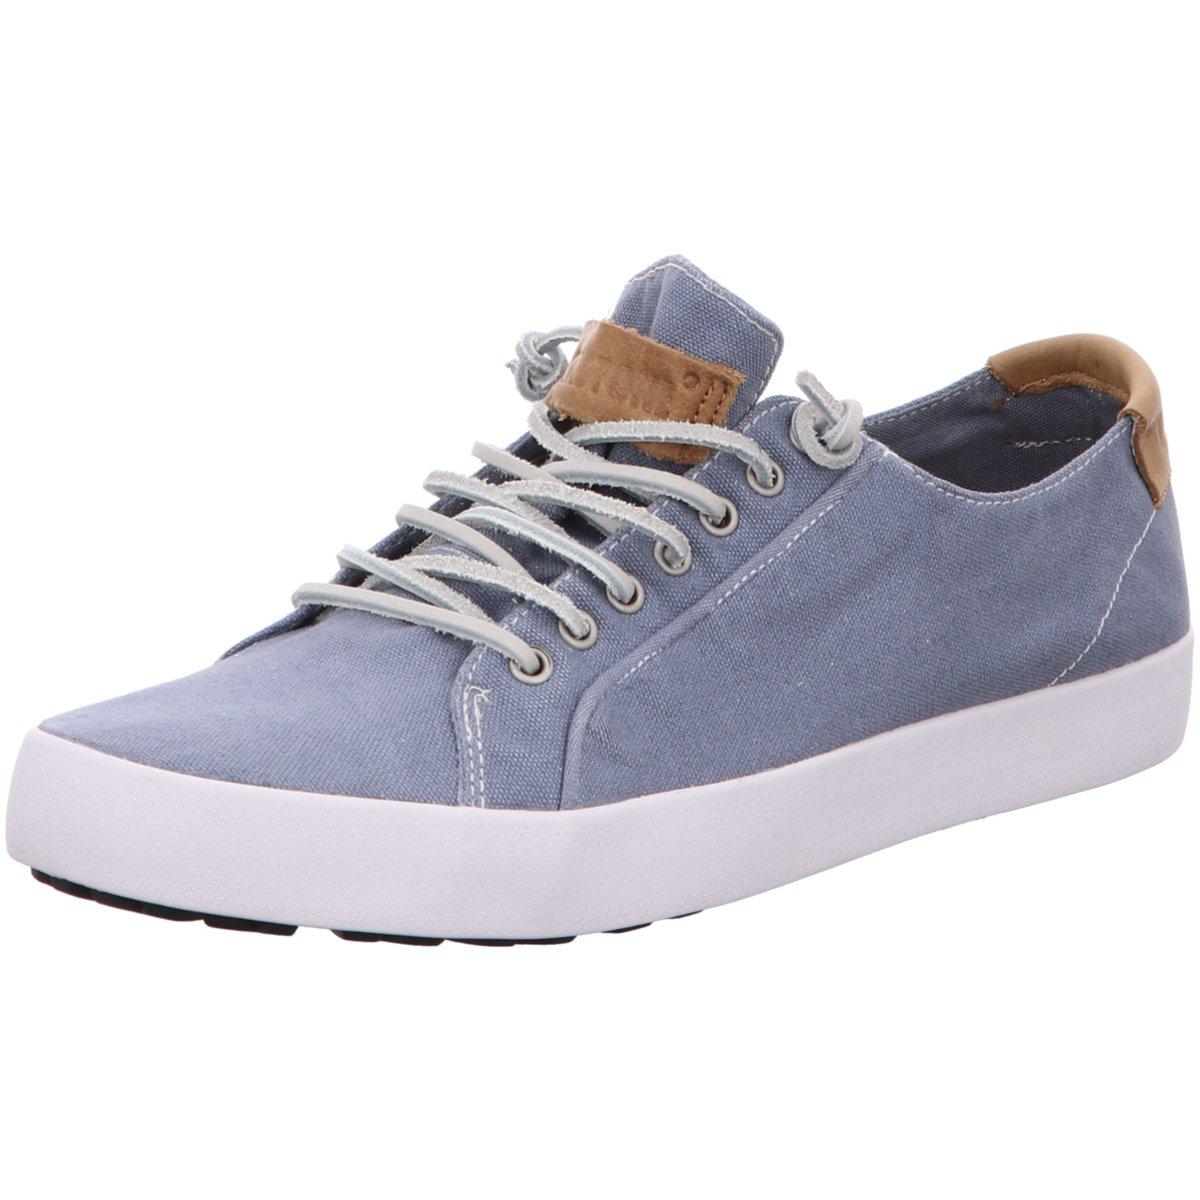 NEU Blackstone Herren Sneaker Blackstone NM95 blau 276552